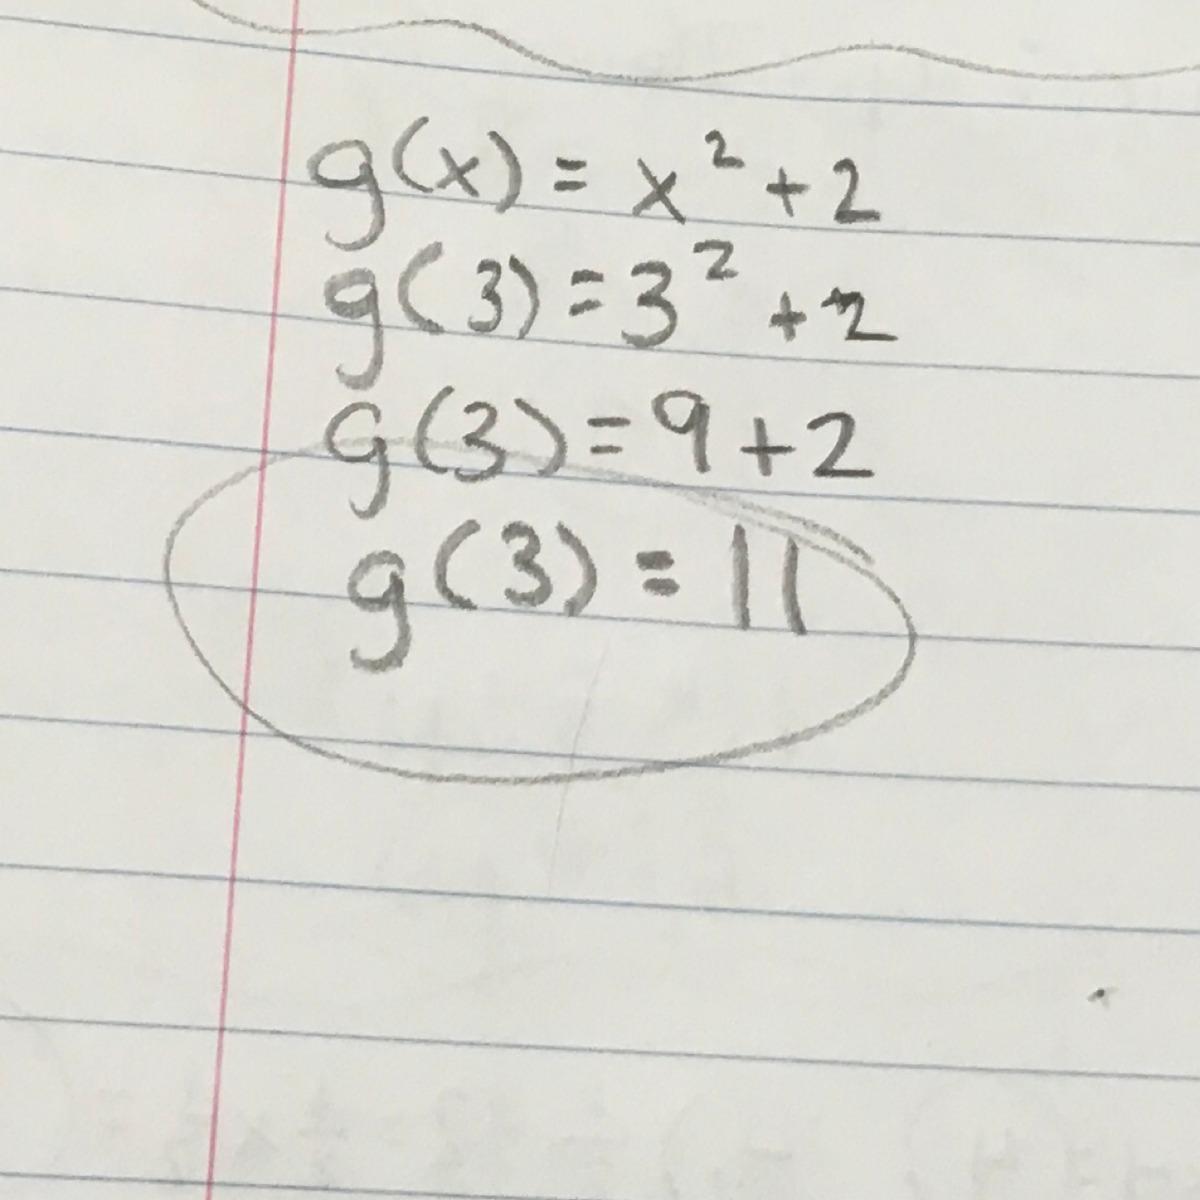 If g(x) = x2 + 2, find g(3) - Brainly.com